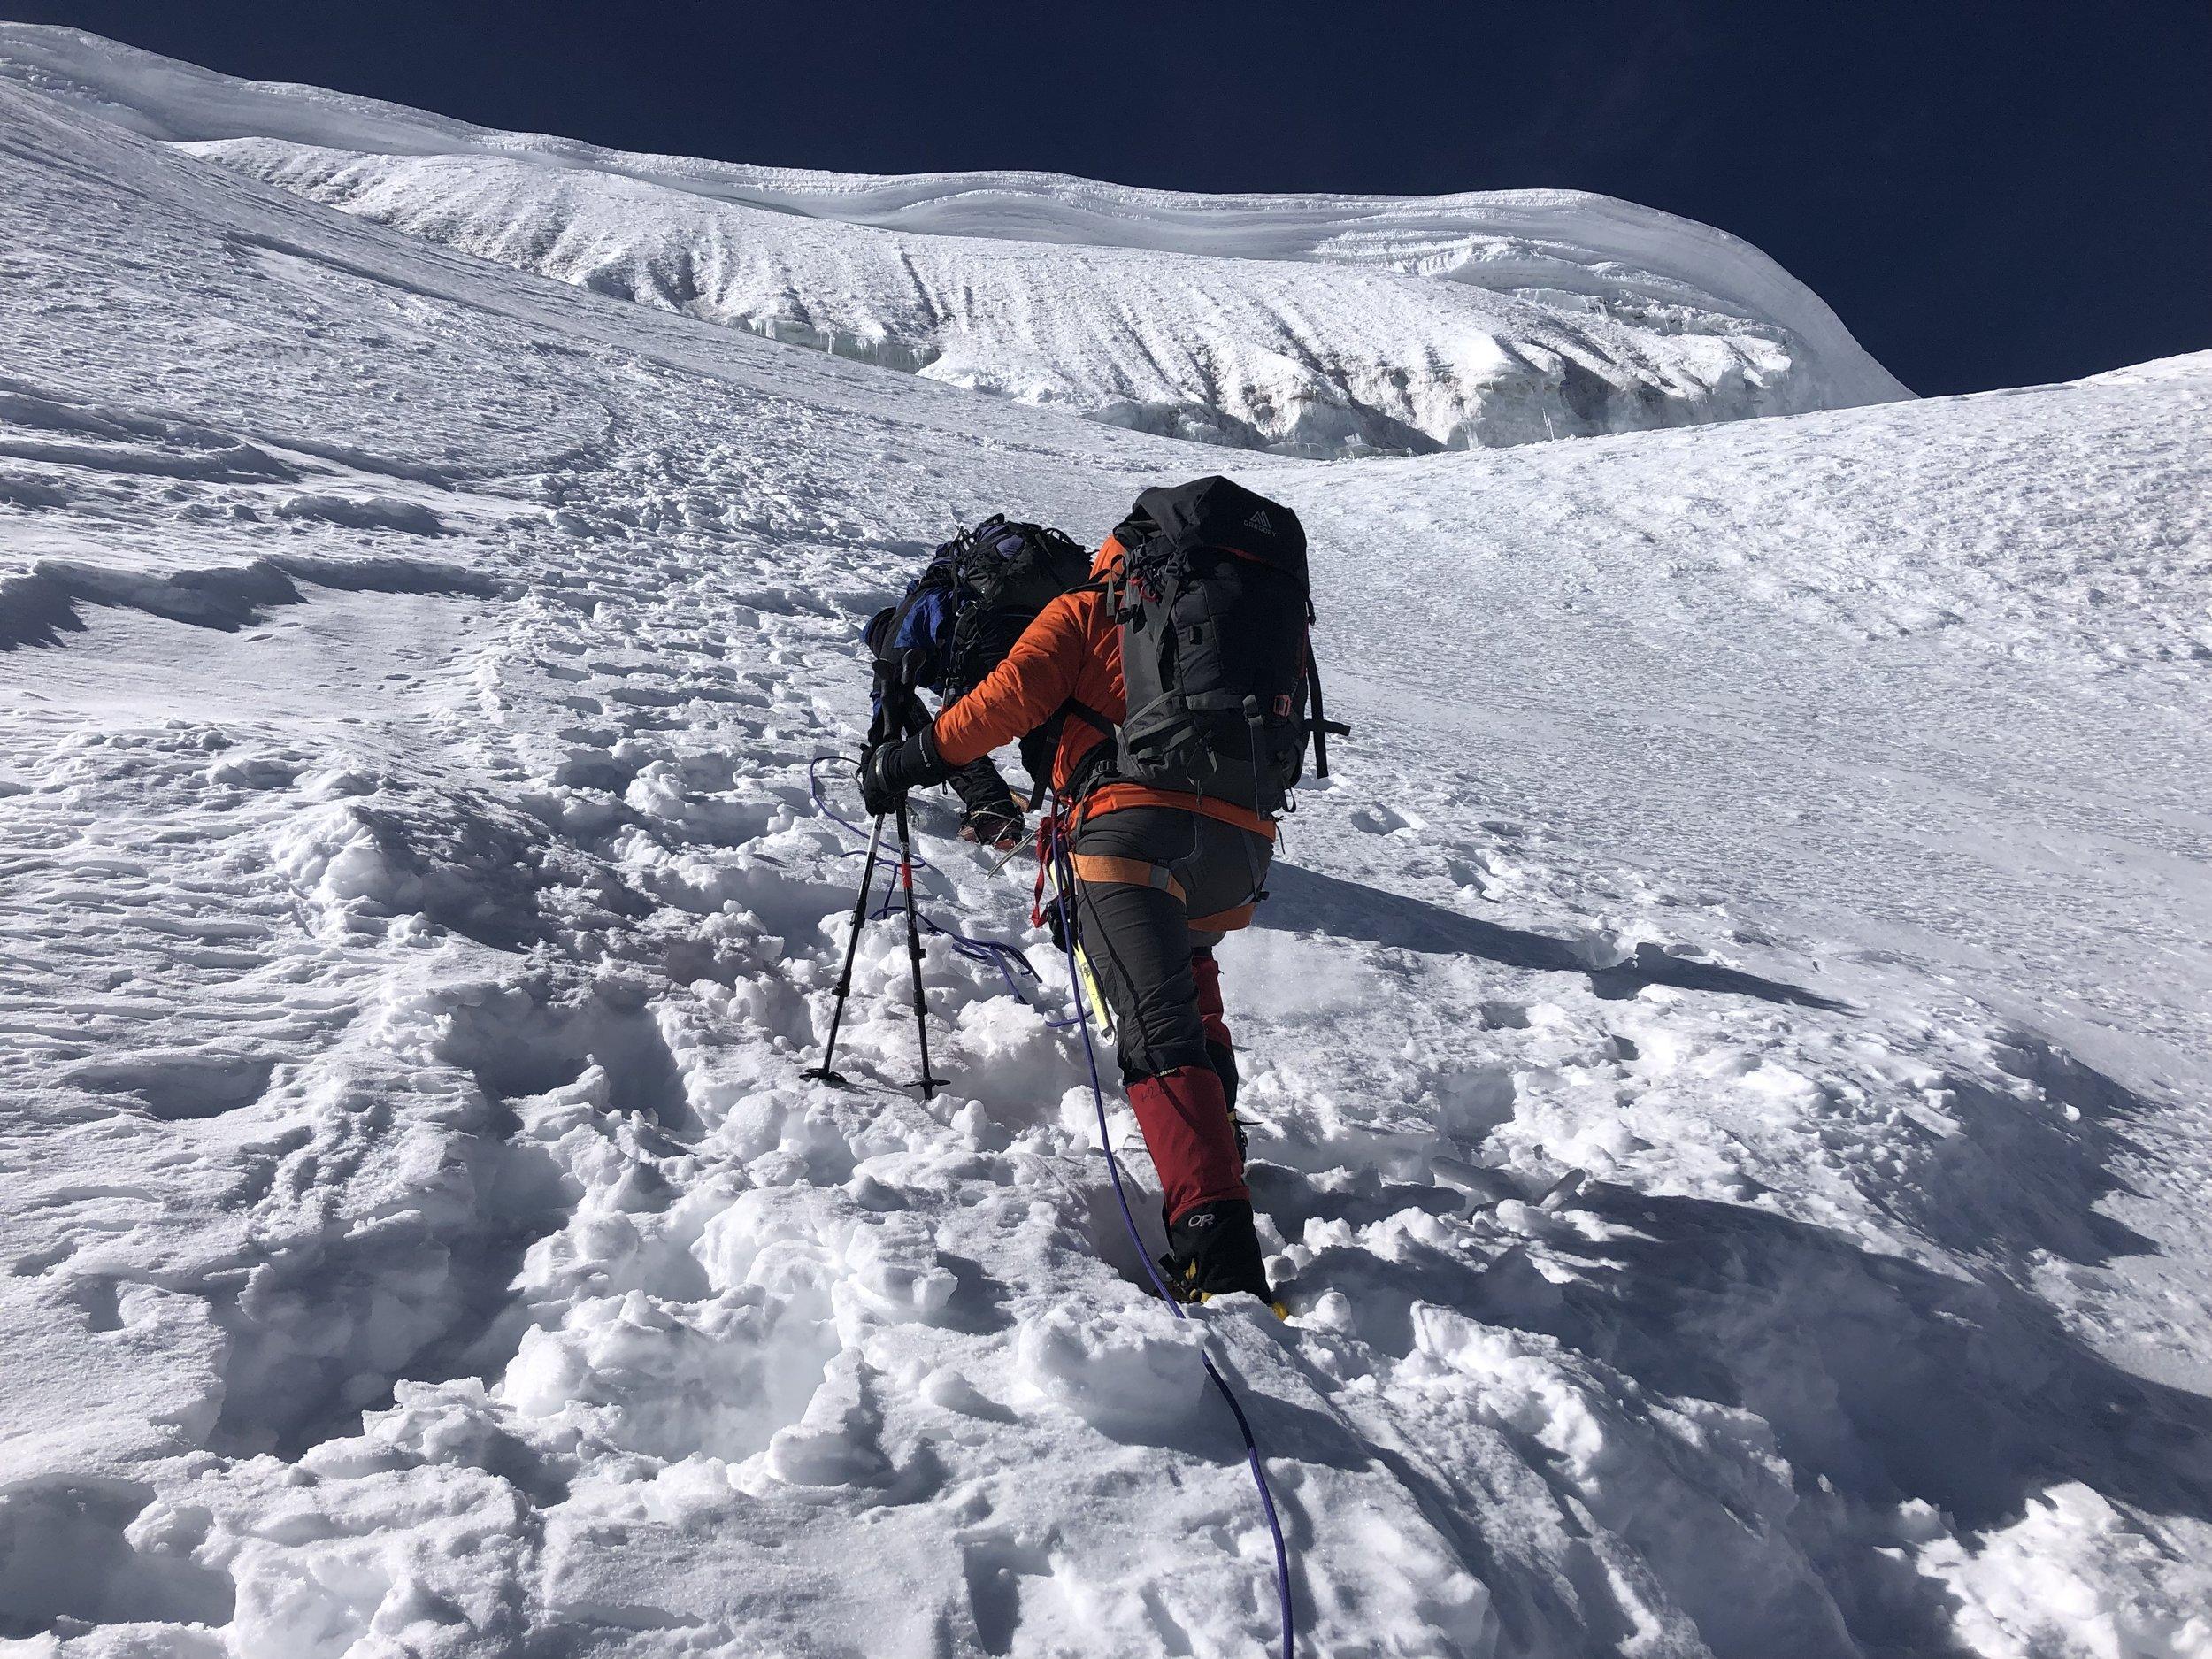 Coming close the the summit ridge.